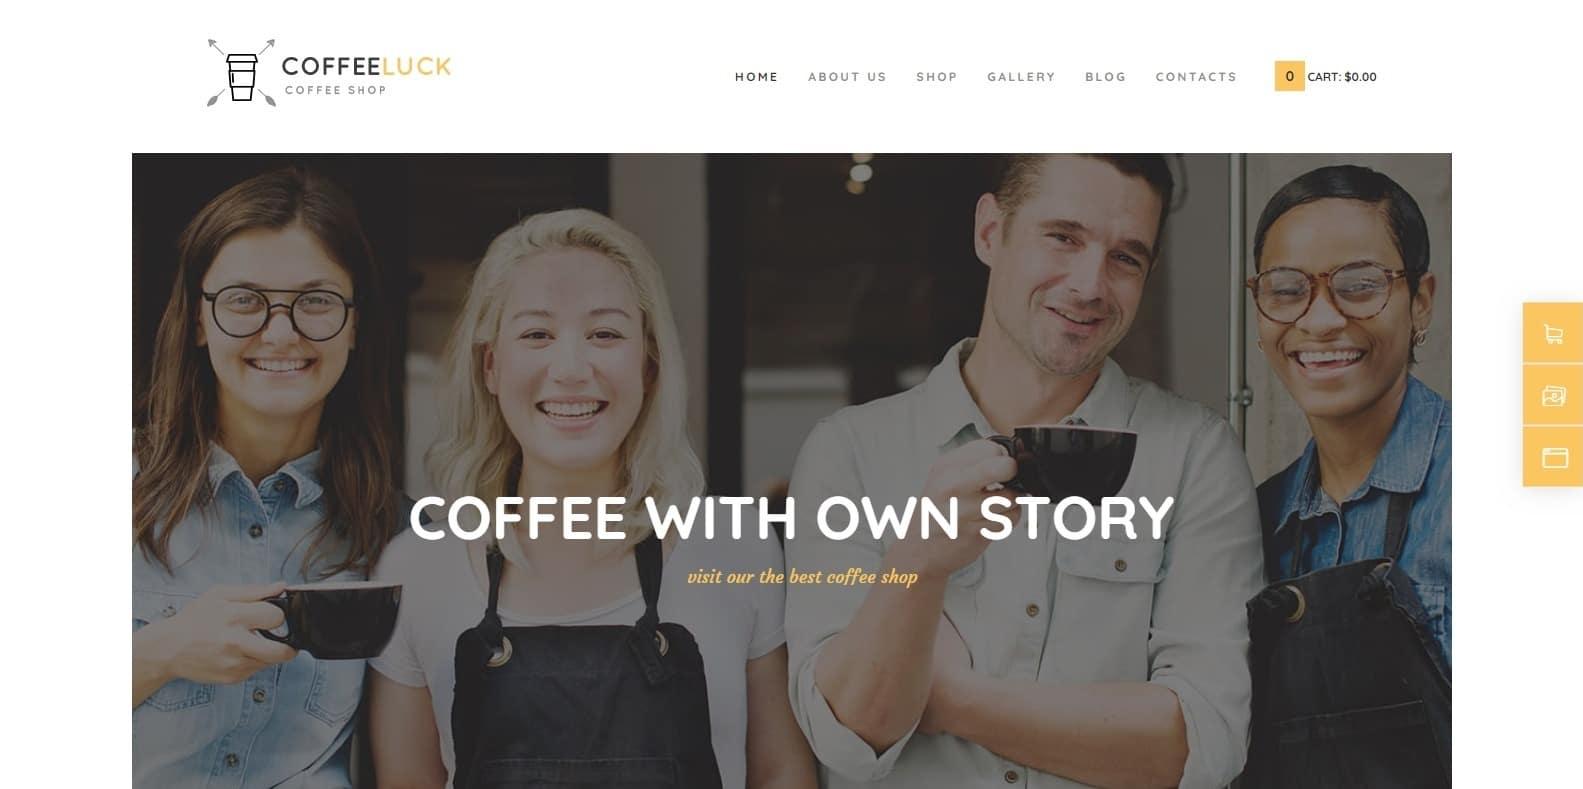 coffeeluck-coffee-shop-website-template